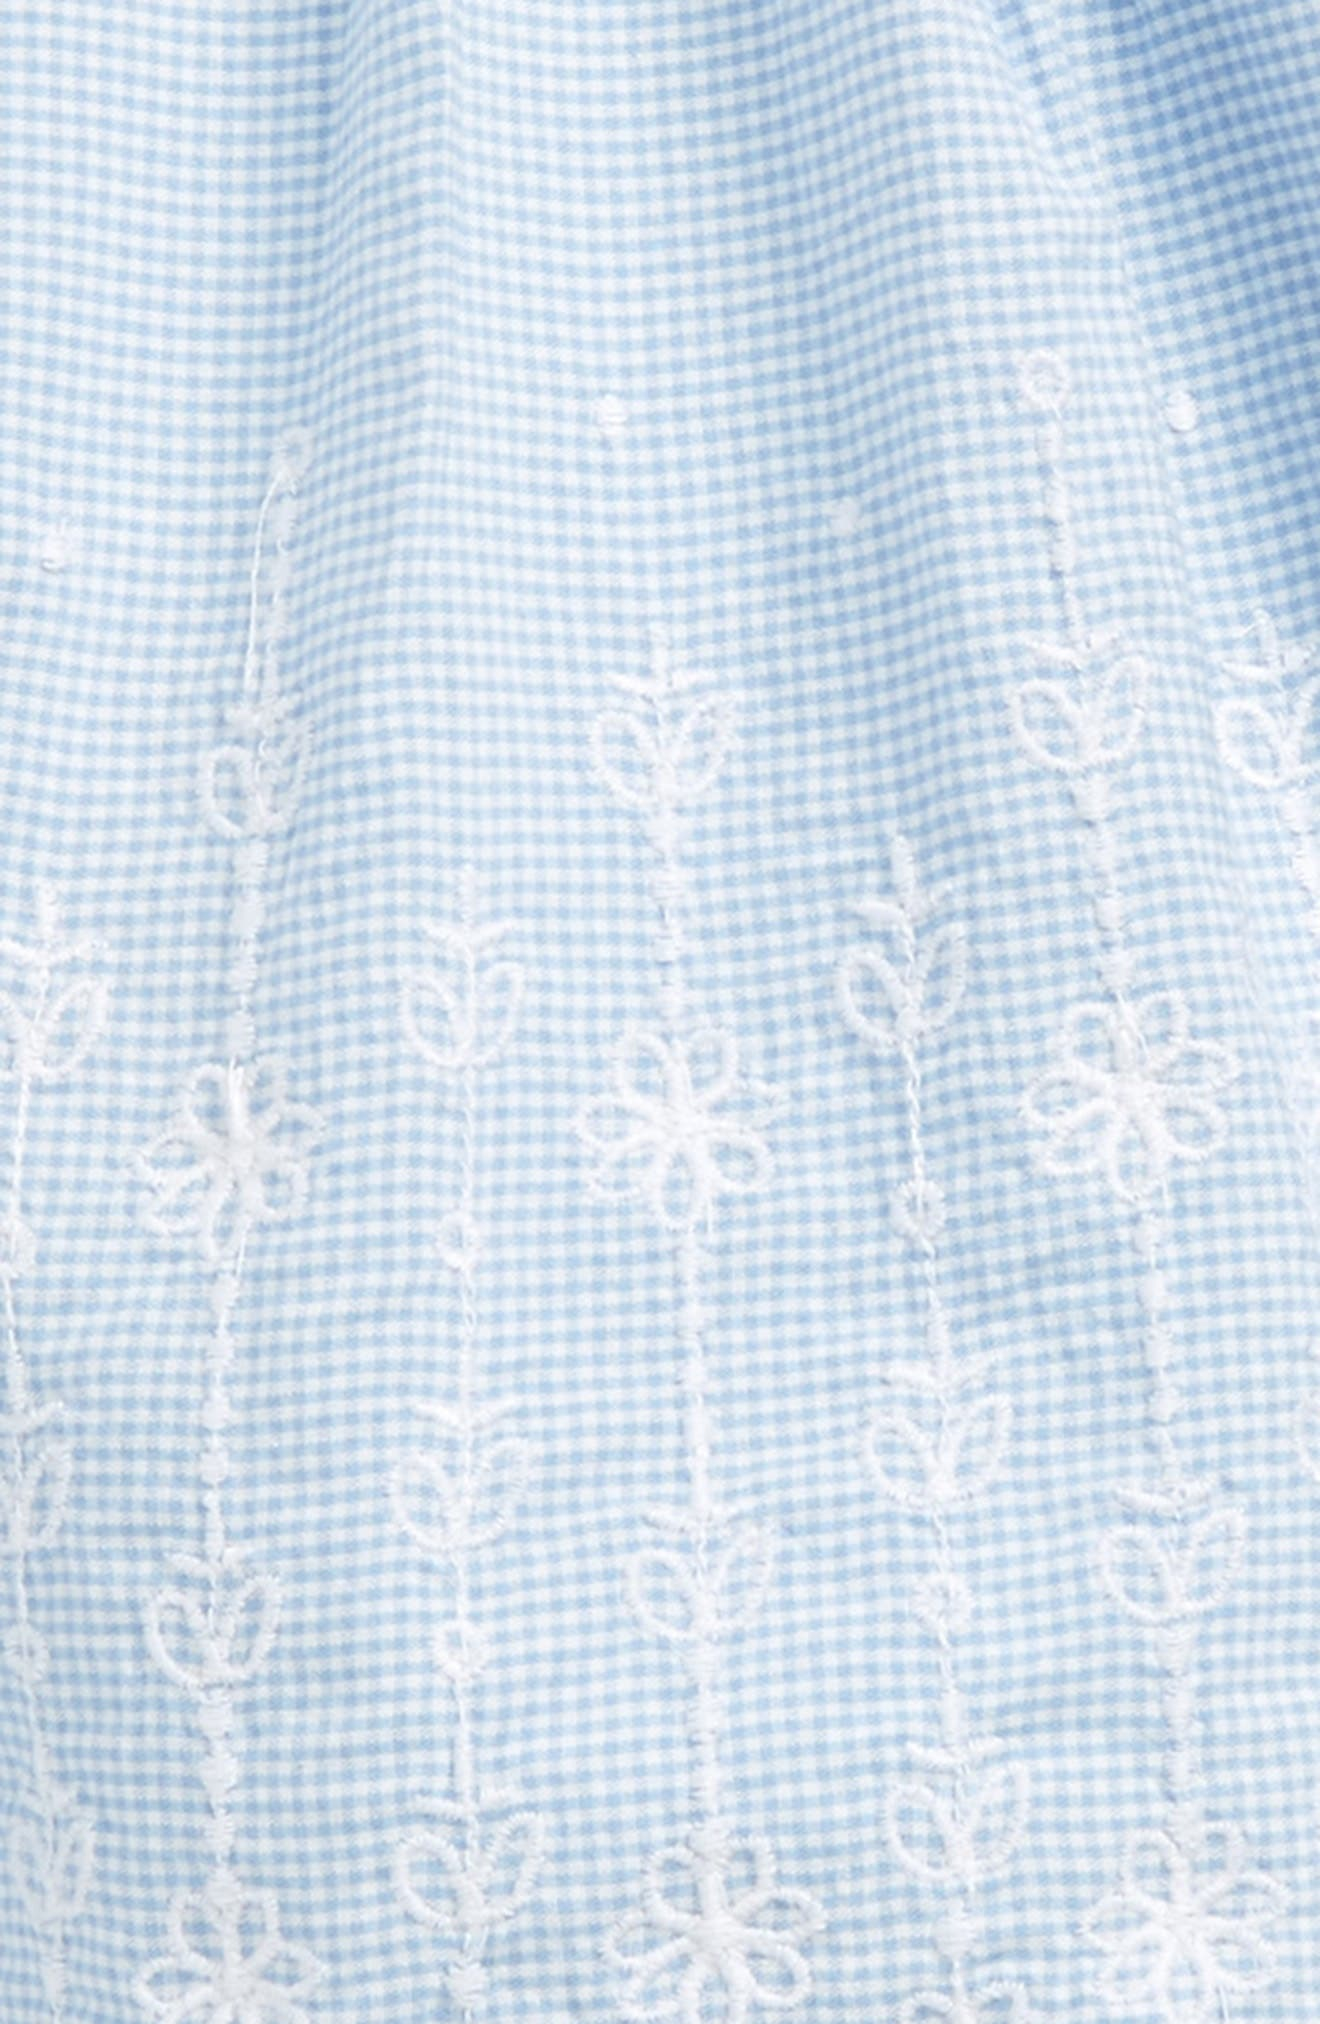 Embroidered Mini Check Dress,                             Alternate thumbnail 2, color,                             White- Blue Mini Check